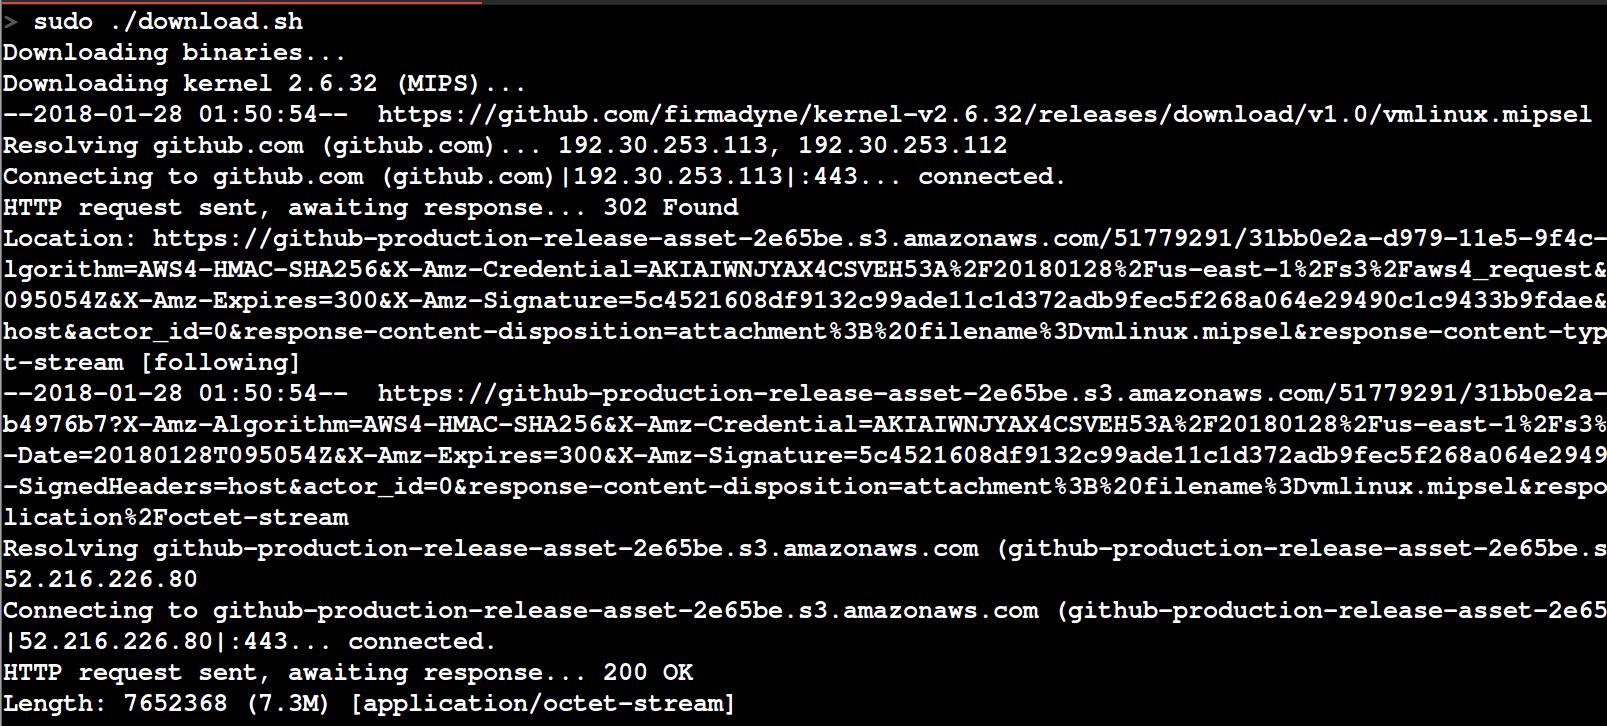 firmadyne-downloading-additional-binaries